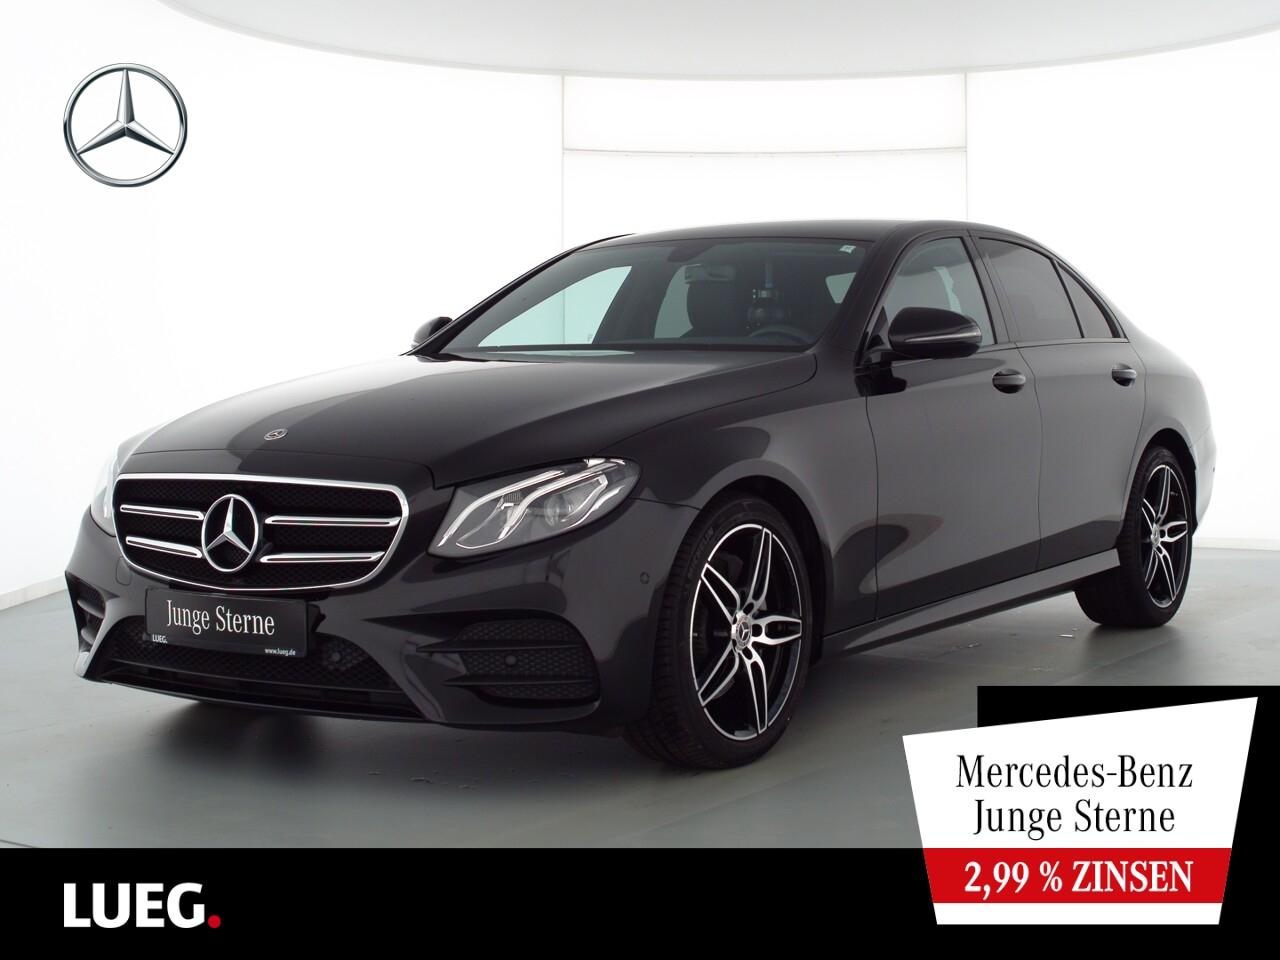 Mercedes-Benz E 200 d AMG+Navi+LED-HP+19''+Night+Totw+ParkA+RF, Jahr 2020, Diesel